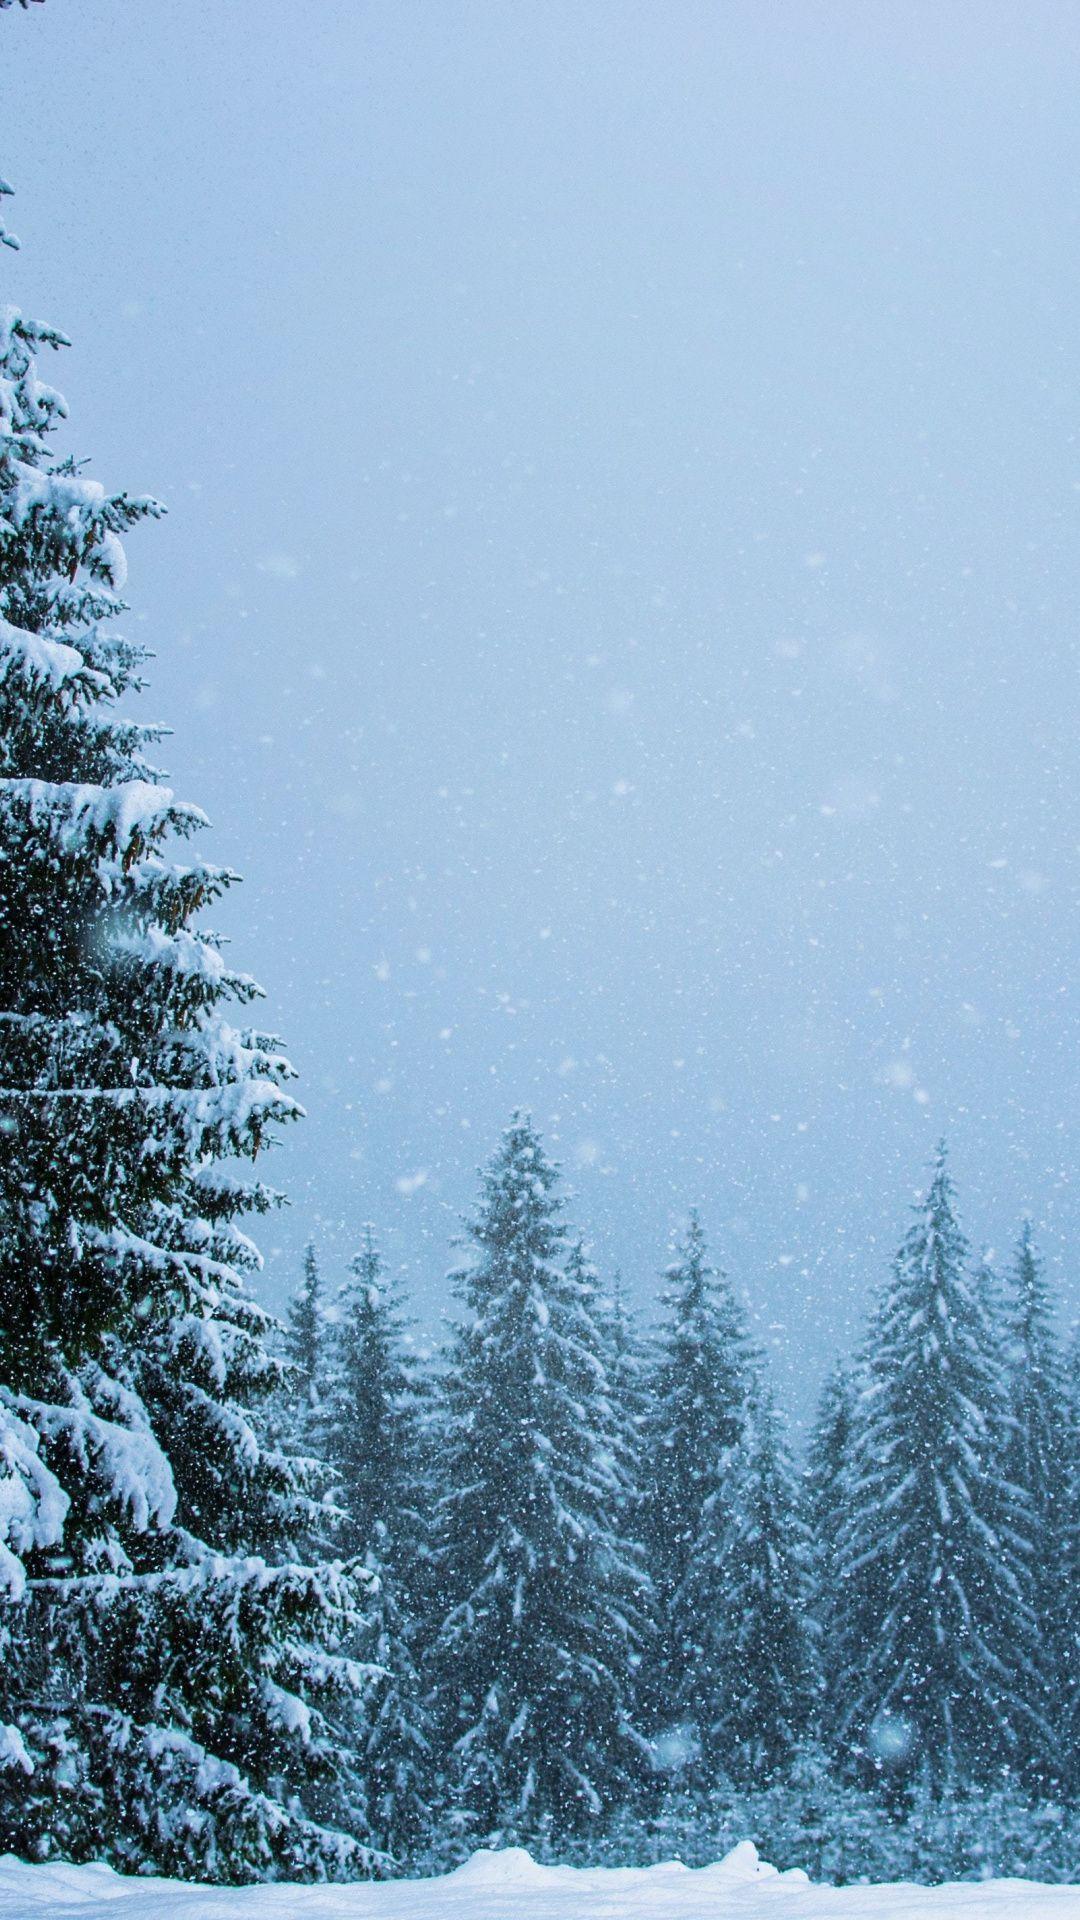 Snowfall Winter Pine Trees Nature 1080x1920 Wallpaper Mountain Wallpaper Wallpaper Desktop Wallpaper